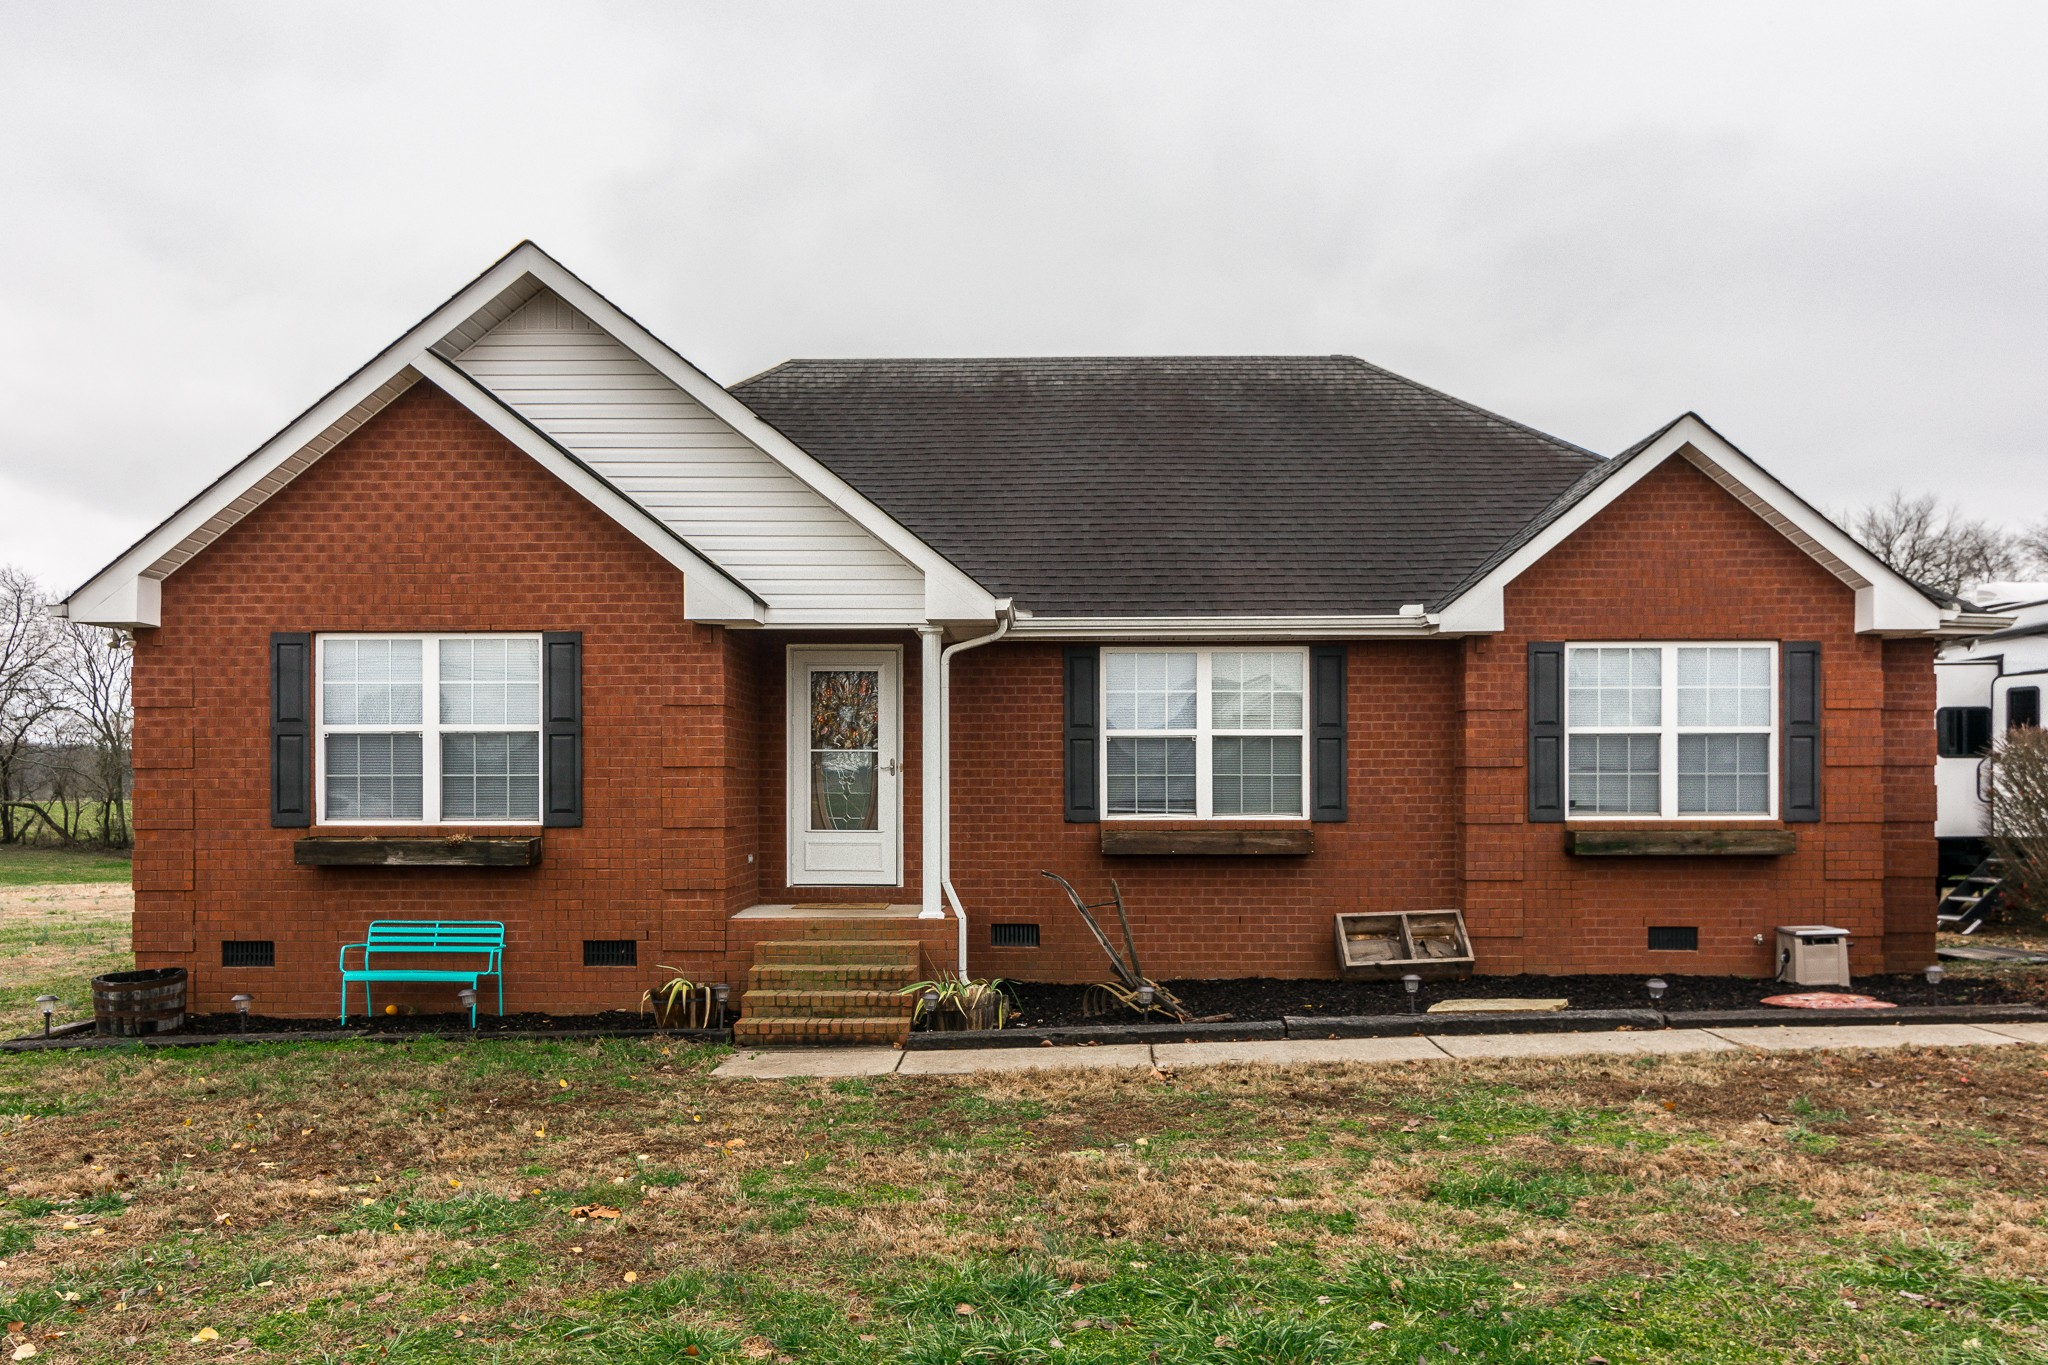 1026 Pinnacle Way Property Photo - Castalian Springs, TN real estate listing